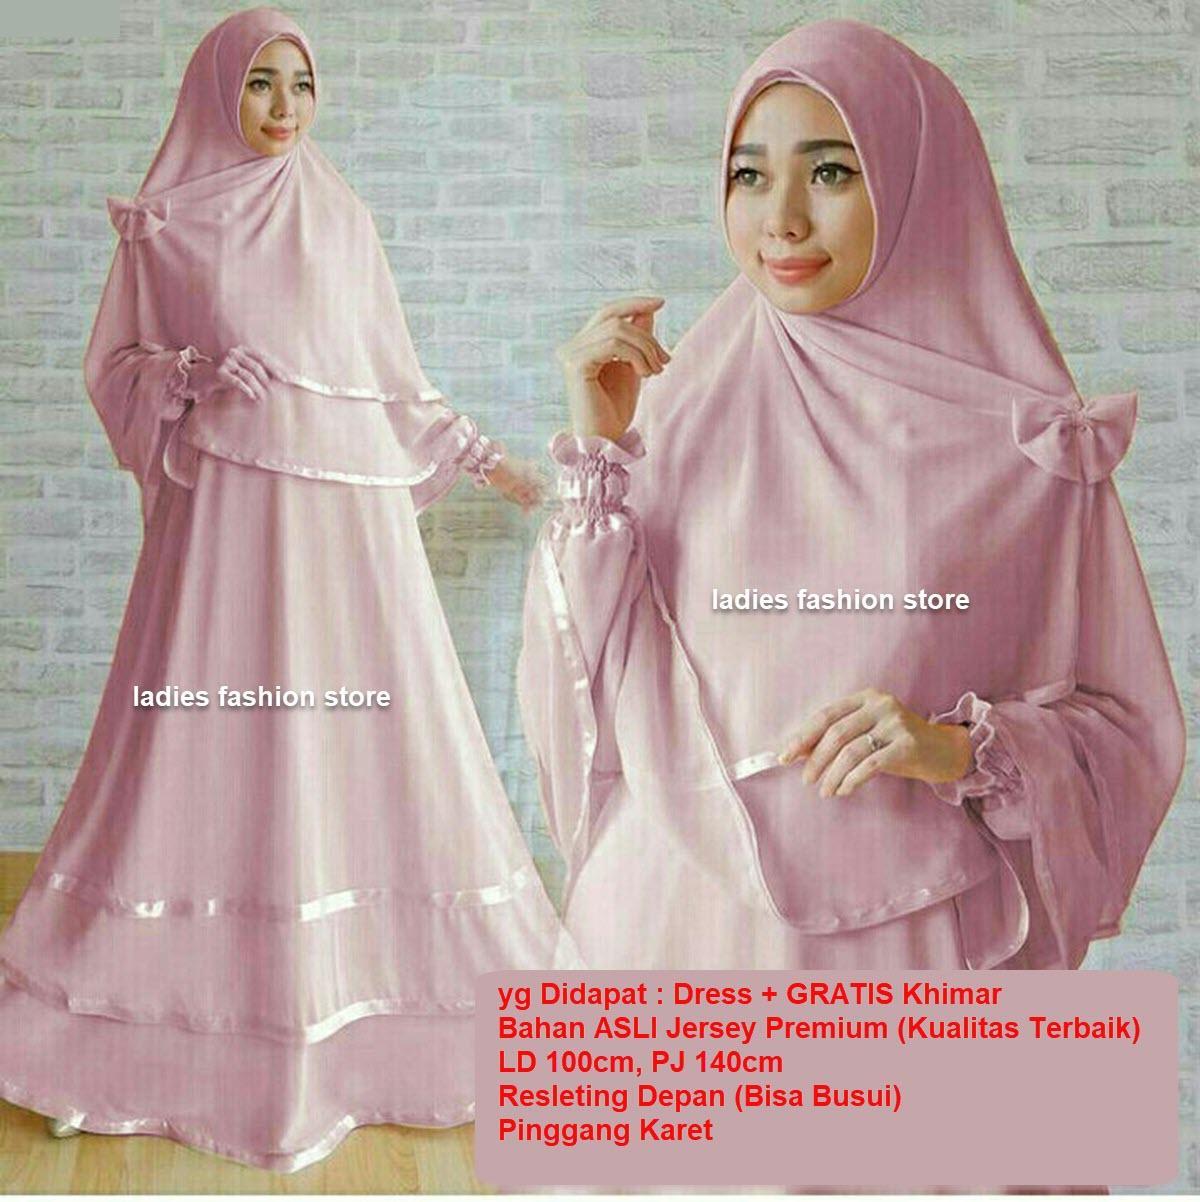 Dress Muslimah BUSUI / Fashion Muslim / Gamis Muslim Syari / Dress Muslim / Gamis Wanita / Baju Muslim / Hijab Muslim / Syar'i Muslim / Maxi Dress Lengan Panjang / Gamis Modern Dress/ Muslimah / Dress Gamis Murah / Pakaian Muslimah 1n (ggunan) DUSTIPINK